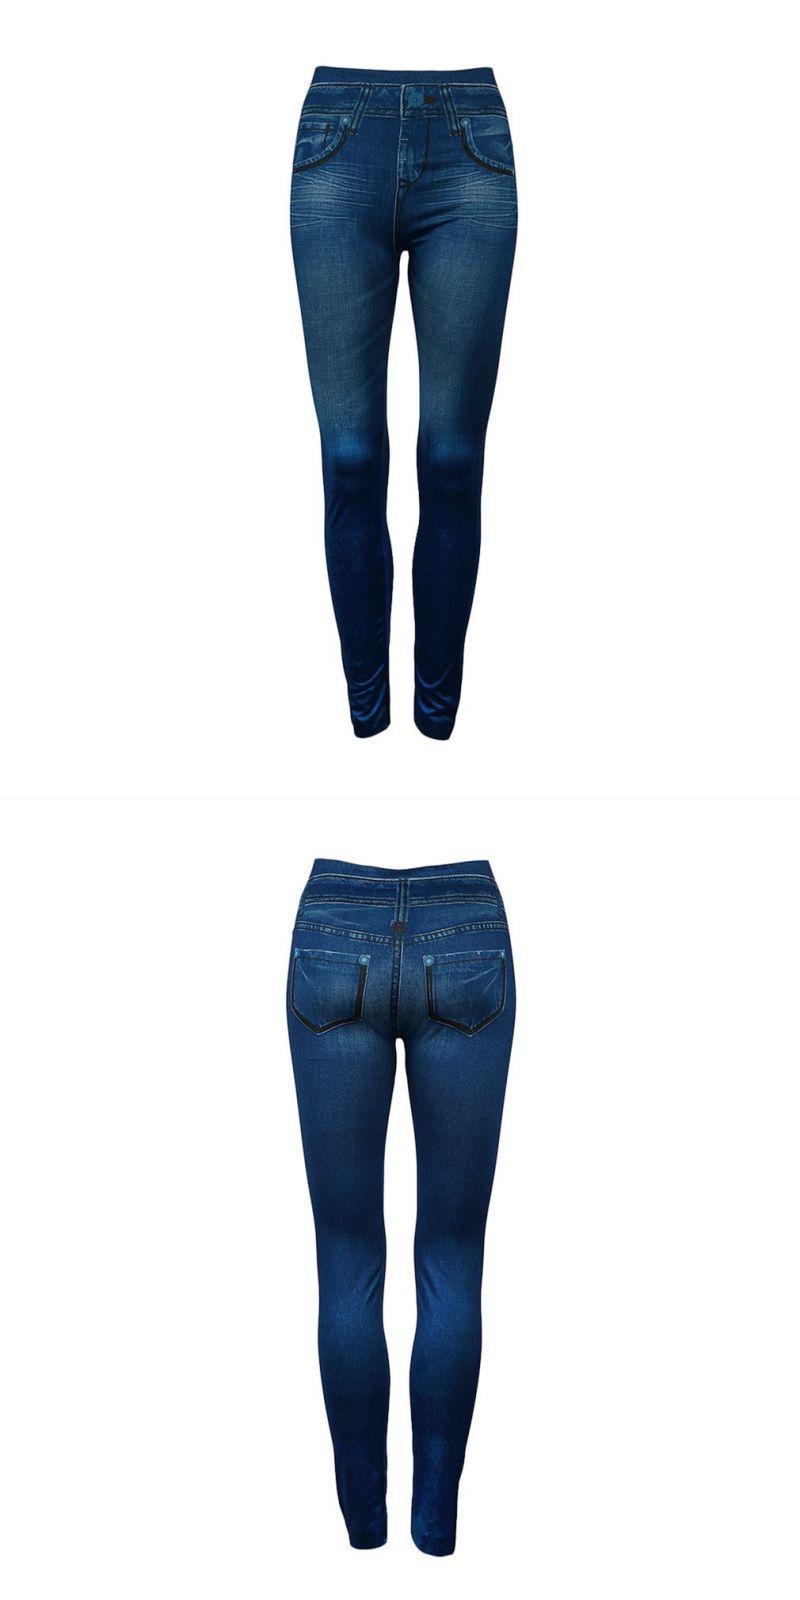 97c80c8ff0b79 Lady denim high waist jeans seamless sexy women jeans skinny stretch slim  pencil pants leggings fashion skinny pants #women #jeans #pencil #pants  #button ...